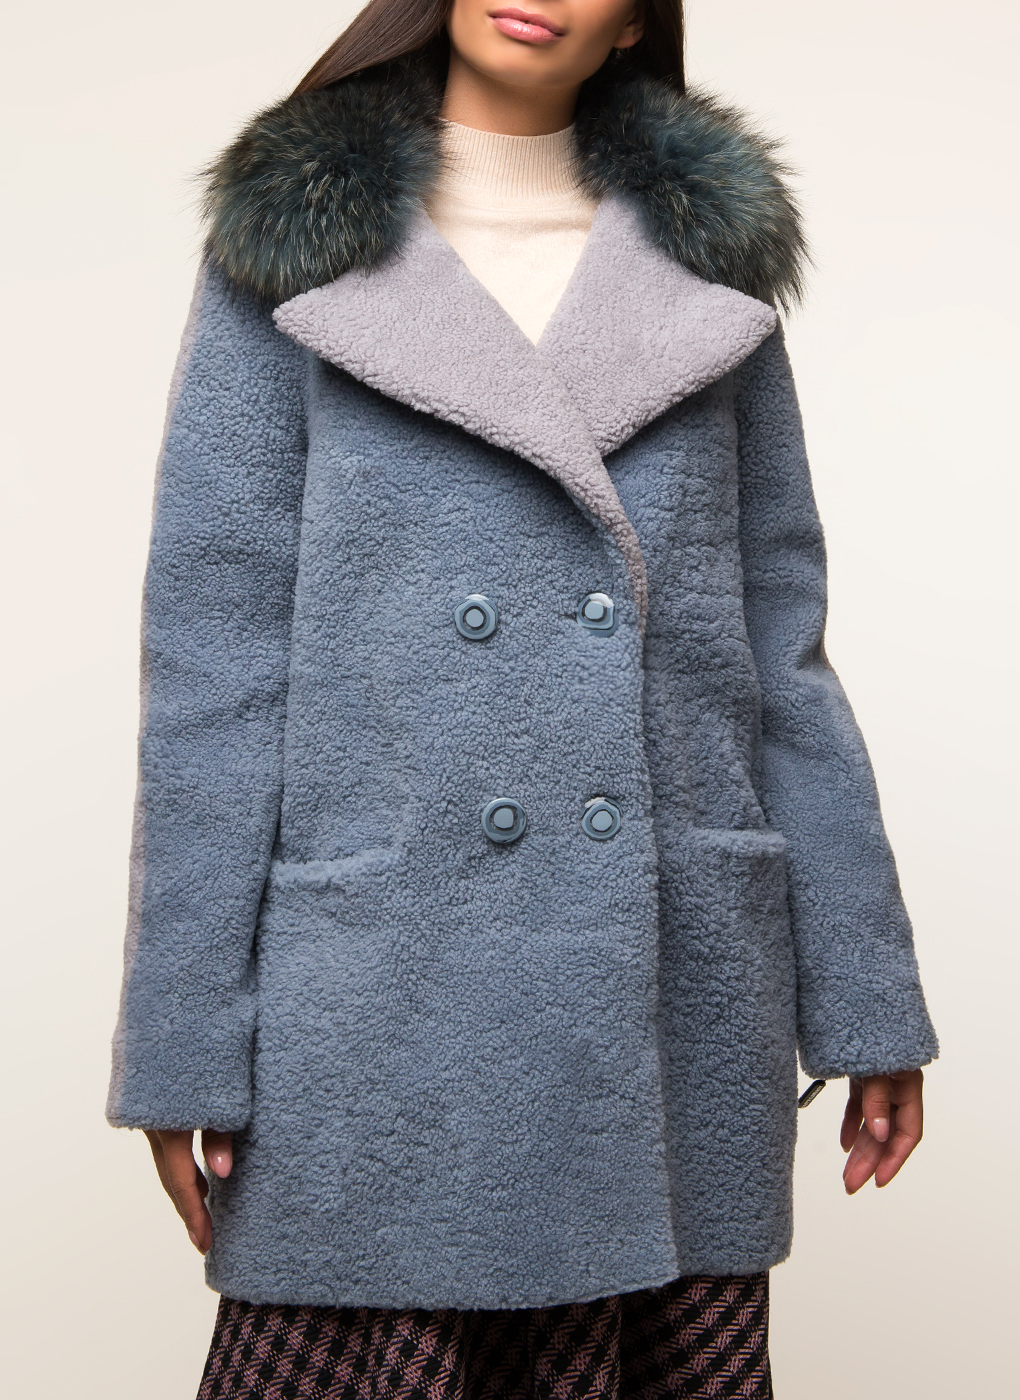 Куртка из овчины 01, Roberto rafio фото